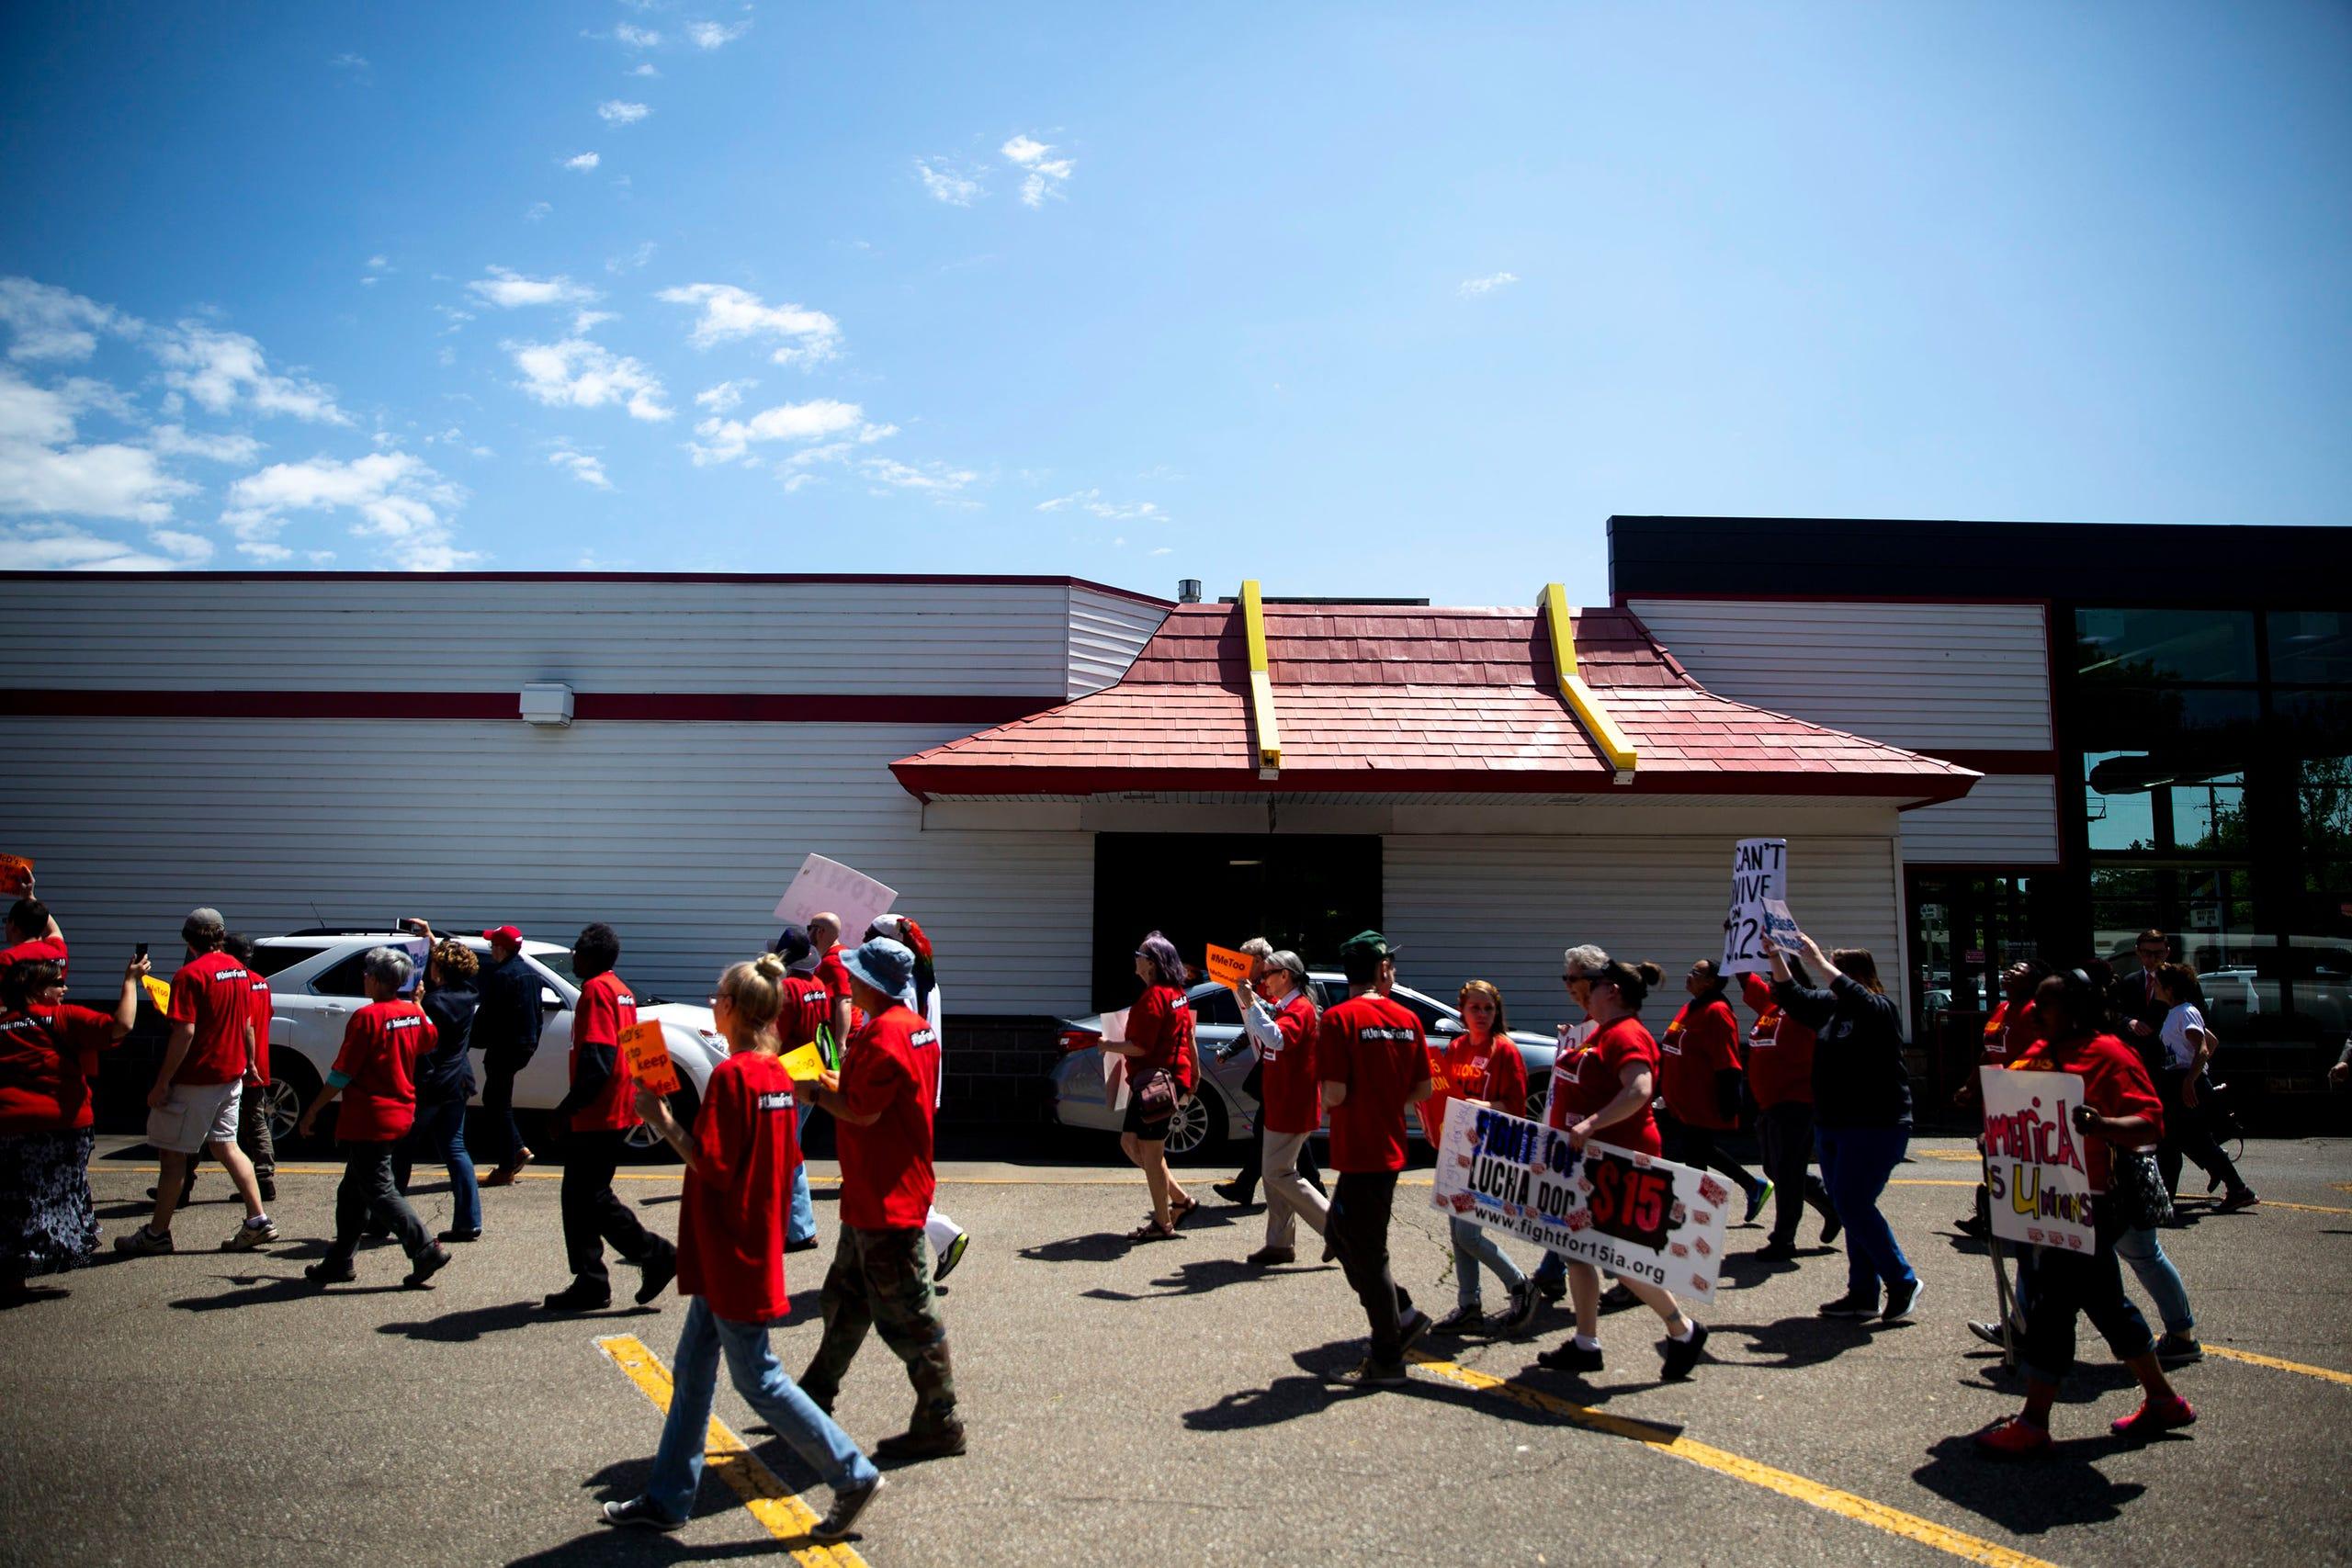 Photos: Minimum wage protest comes to Des Moines